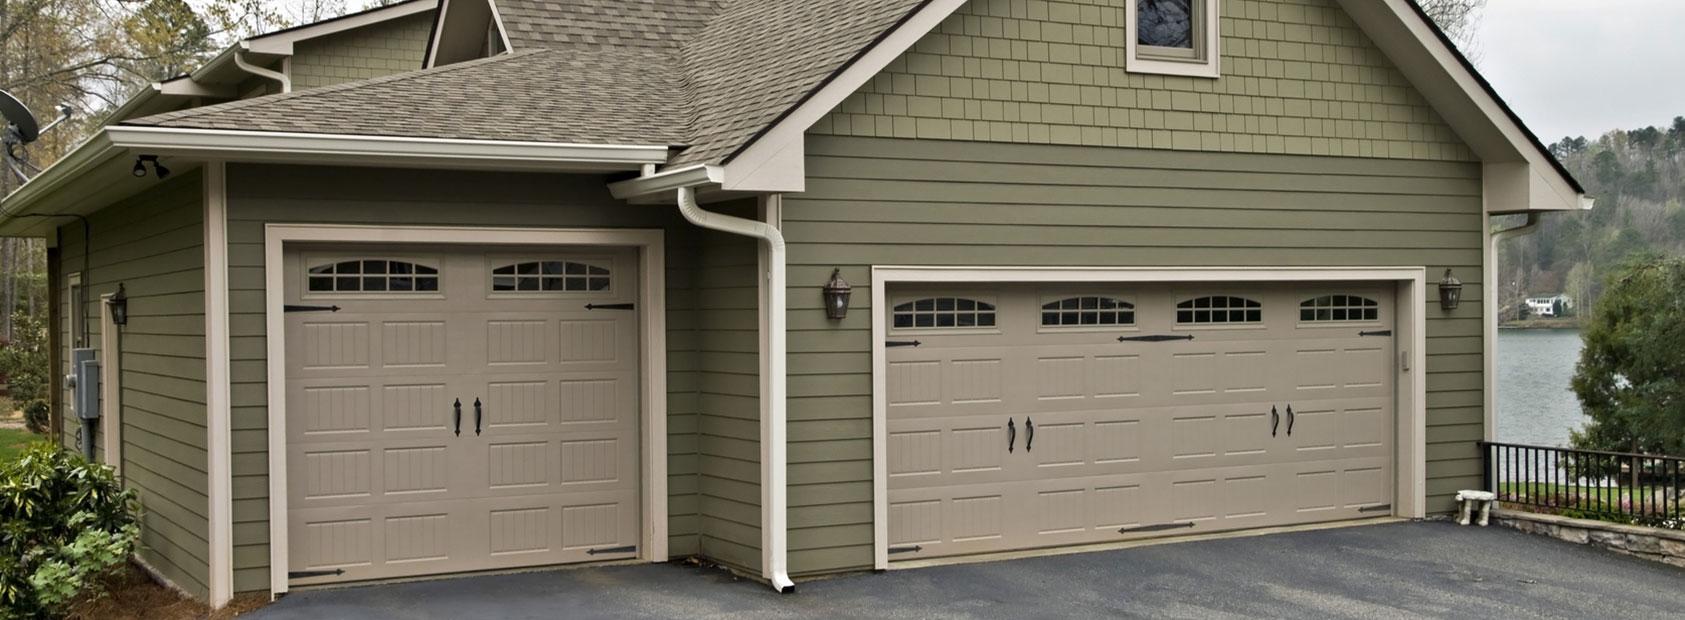 Garage construction choice windows doors rubansaba